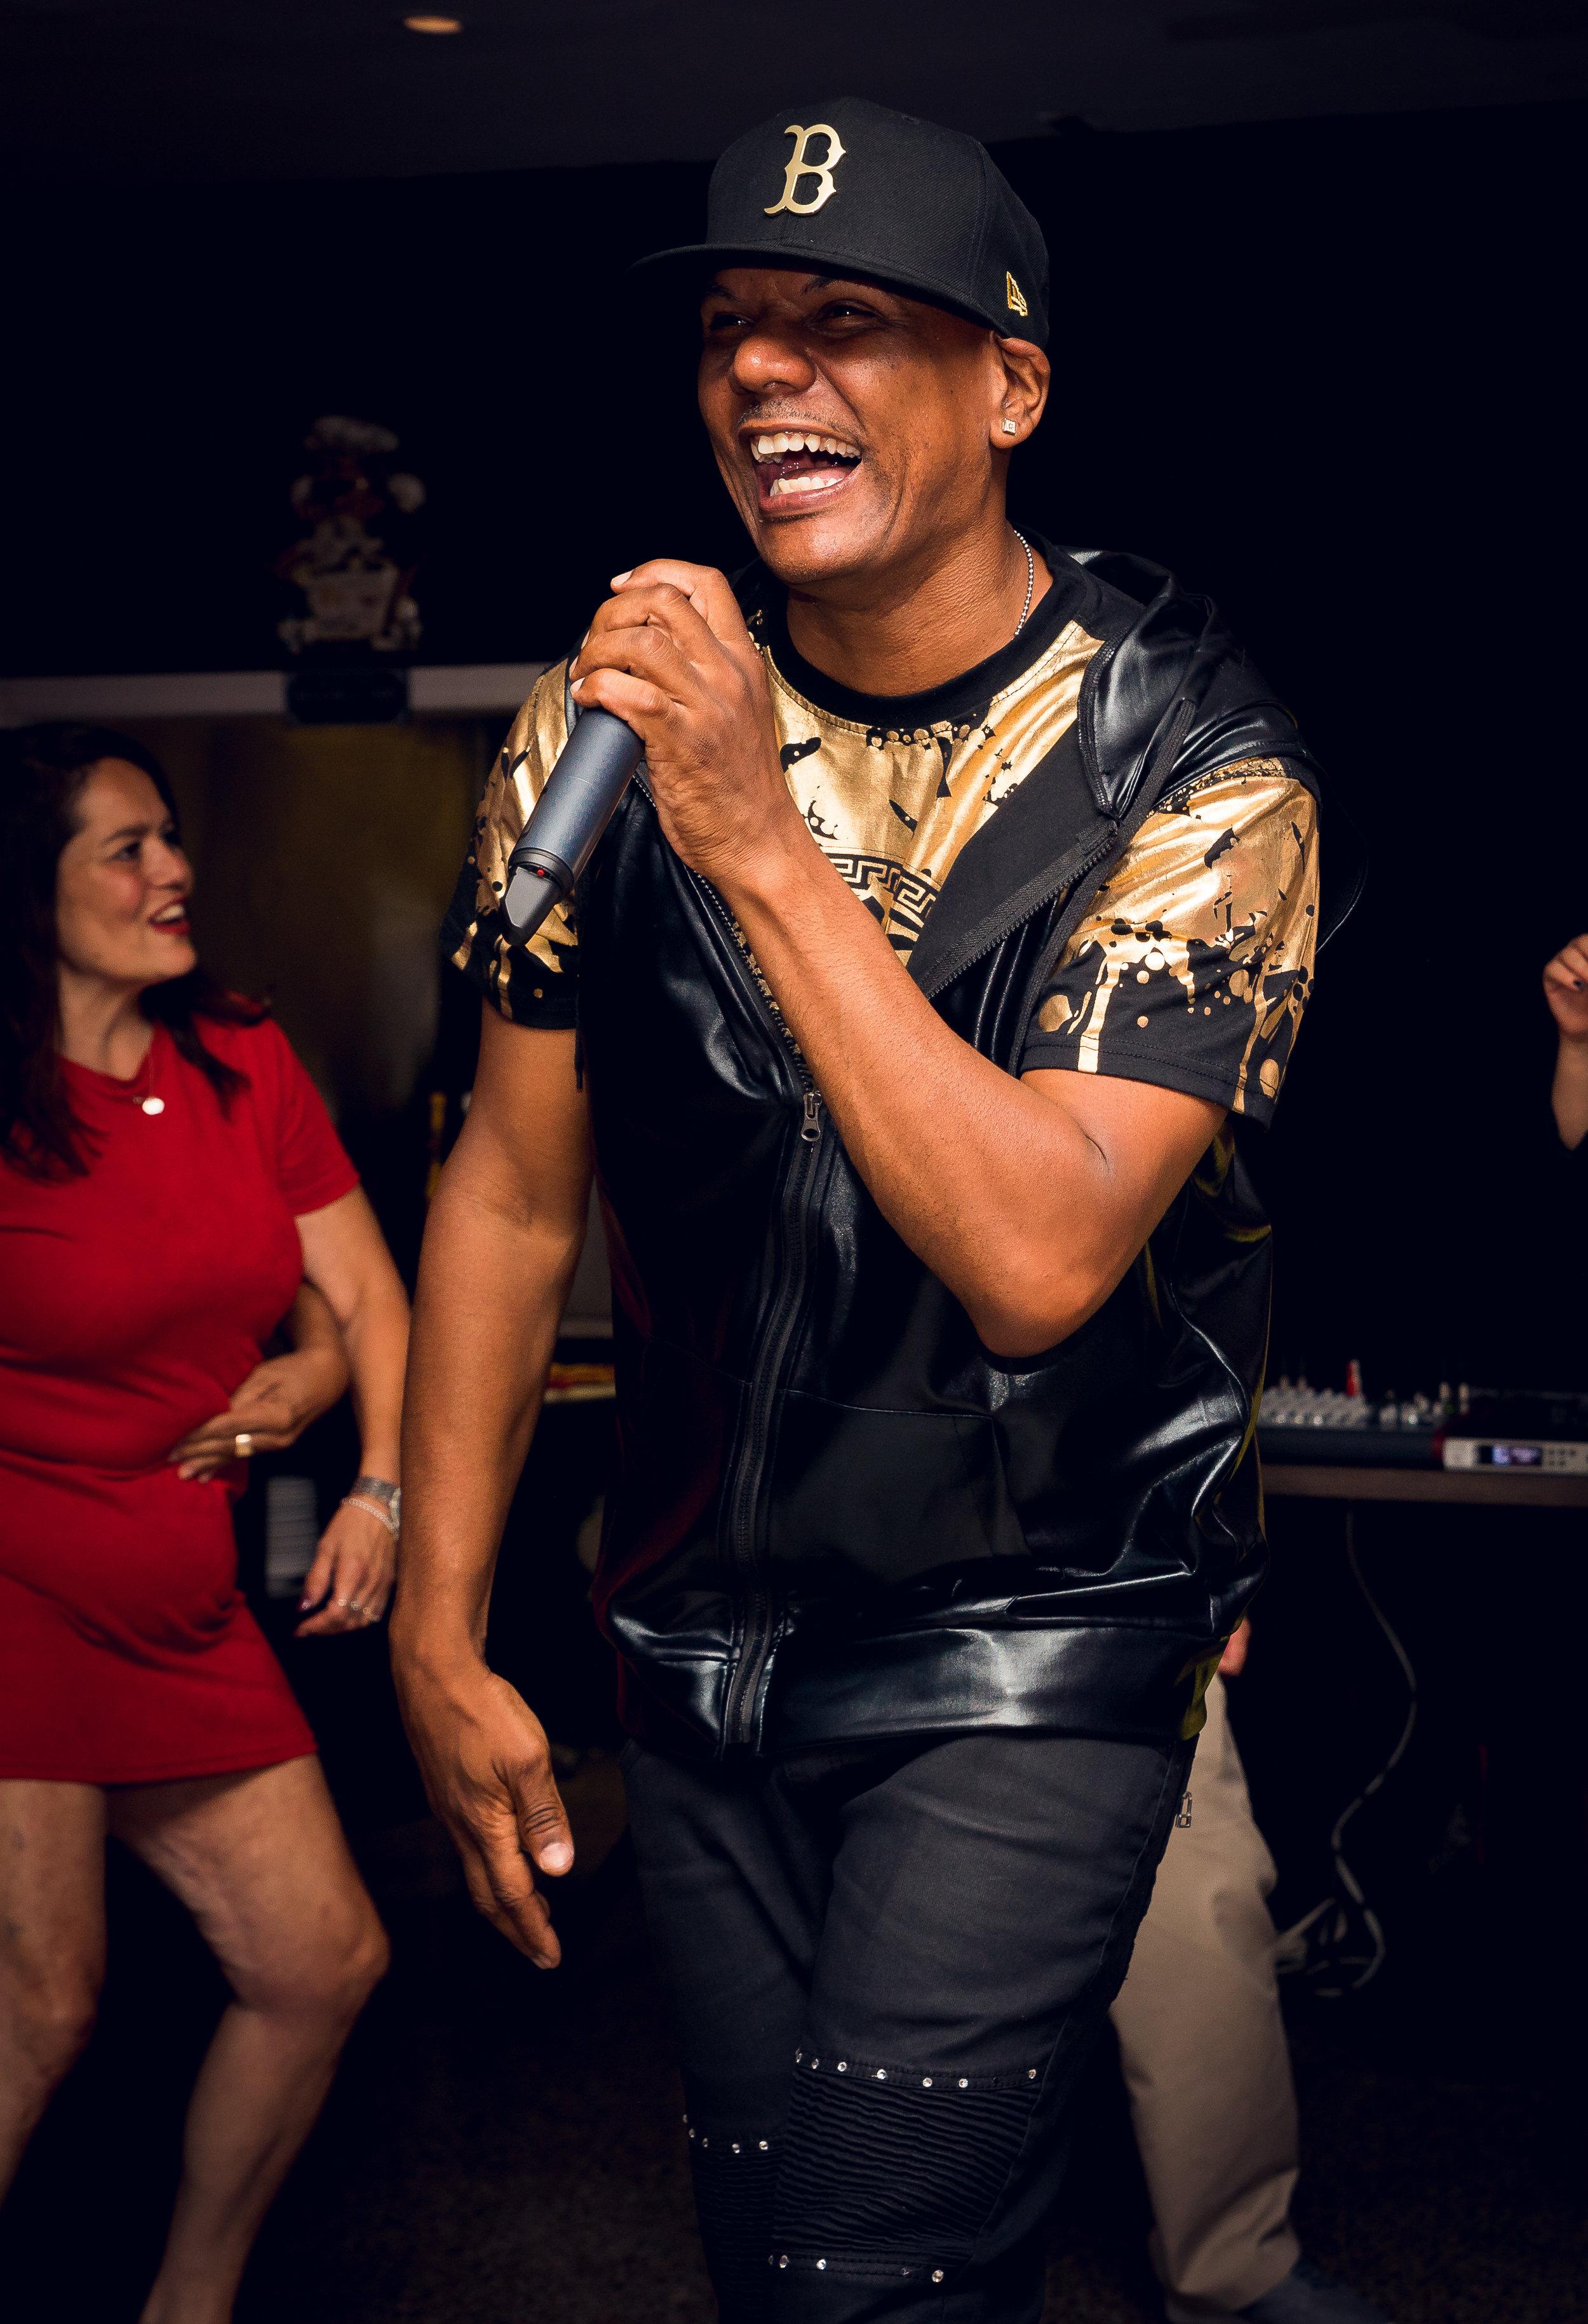 Scottie G of The Funky Bunch Live @ Salto Restaurant - Proofs-89.jpg